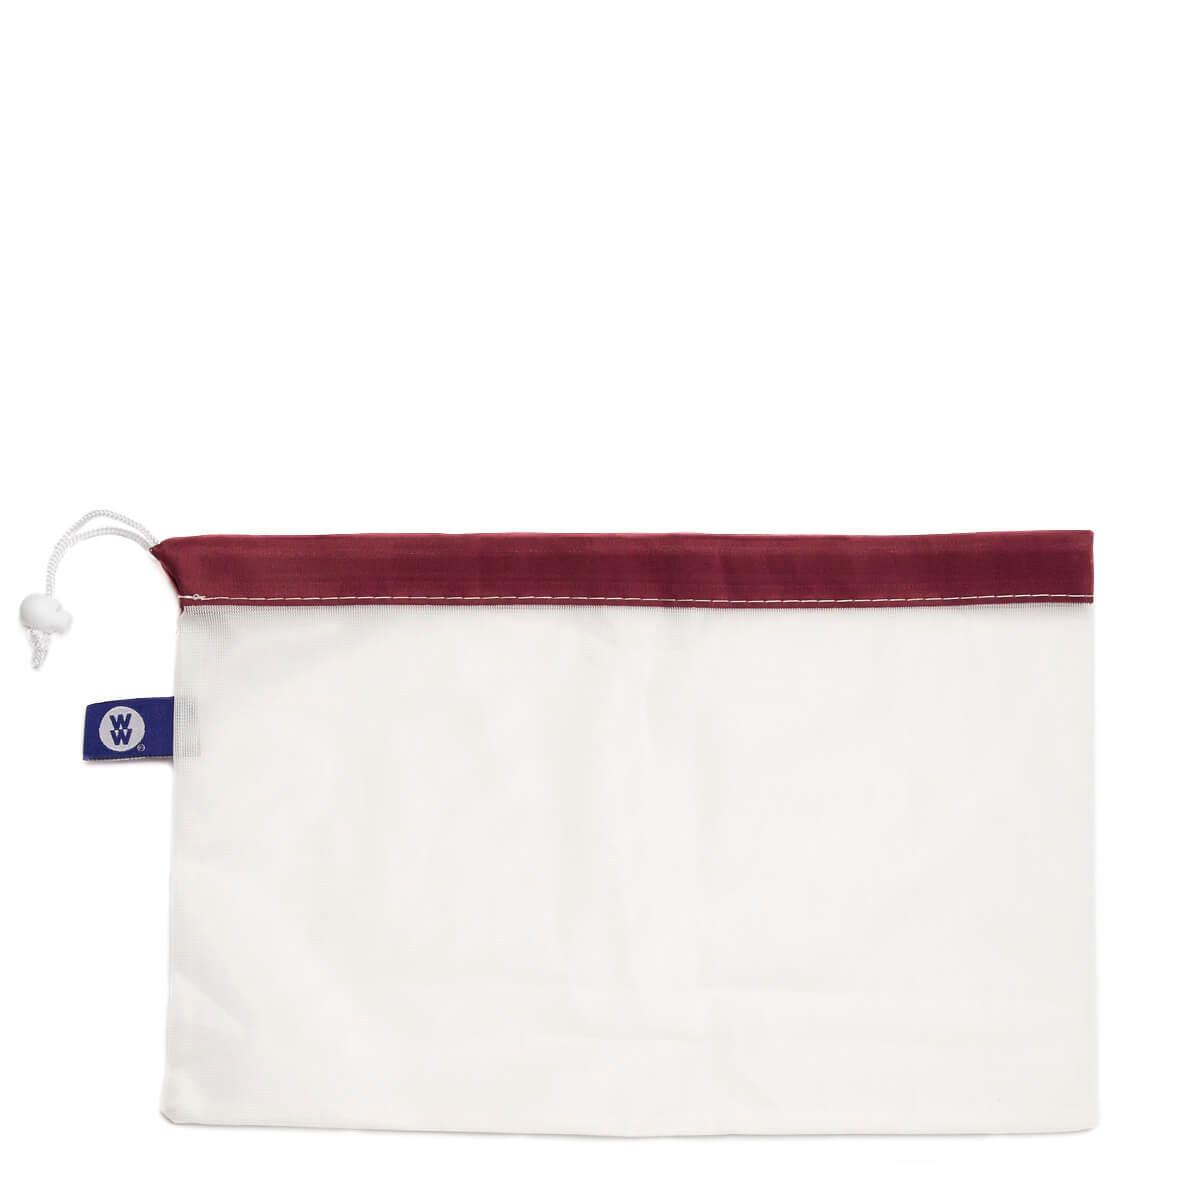 WW Reusable Produce Bags - small